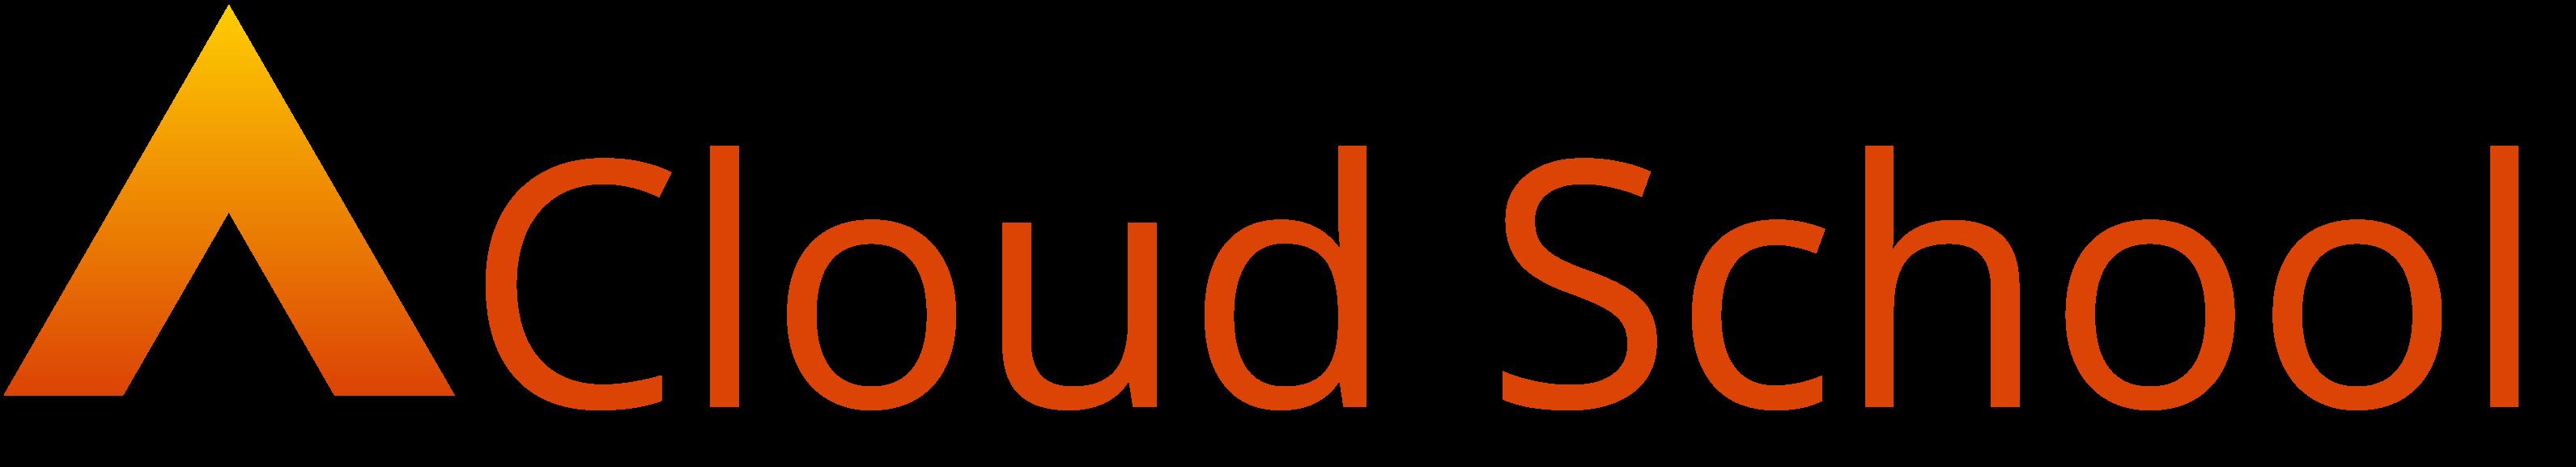 Advance - Cloud School Logo